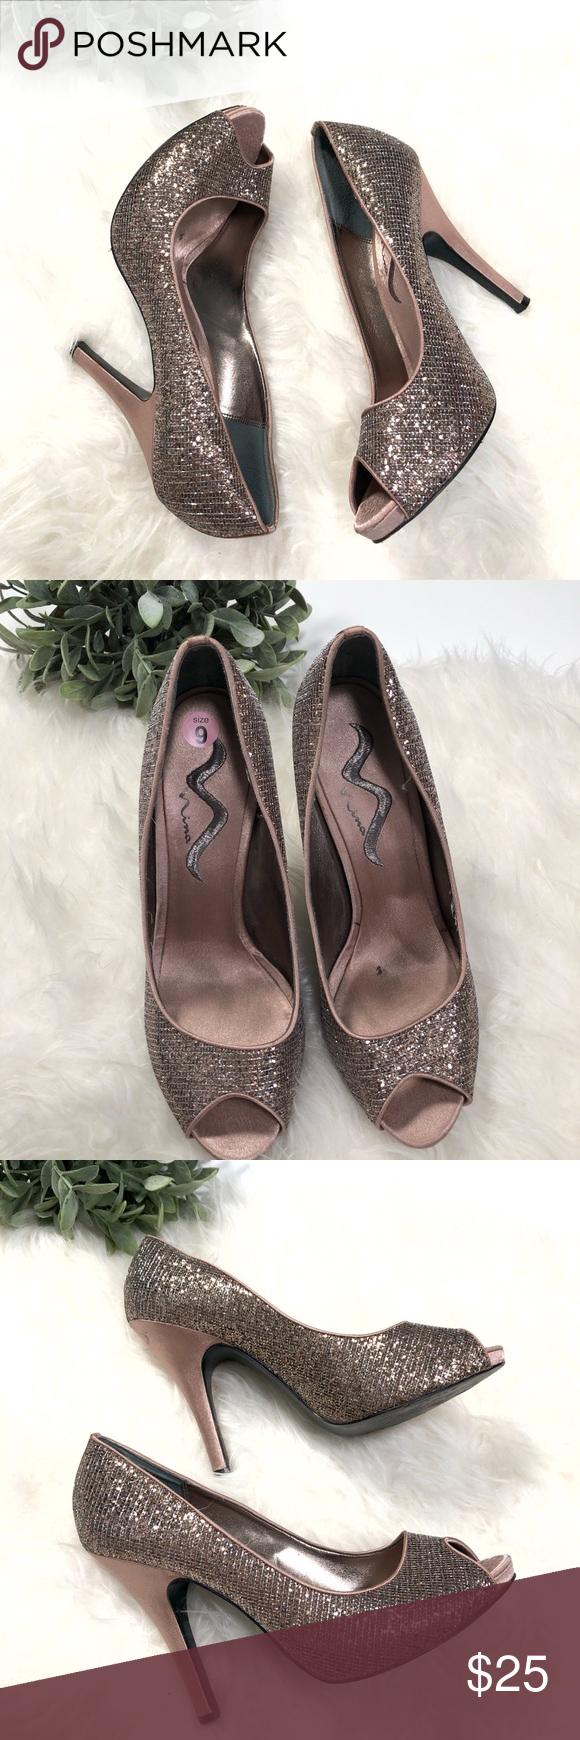 Nina Taupe Glitter High  Heels Size 9   My Posh Closet  High  Pinterest   5b42df